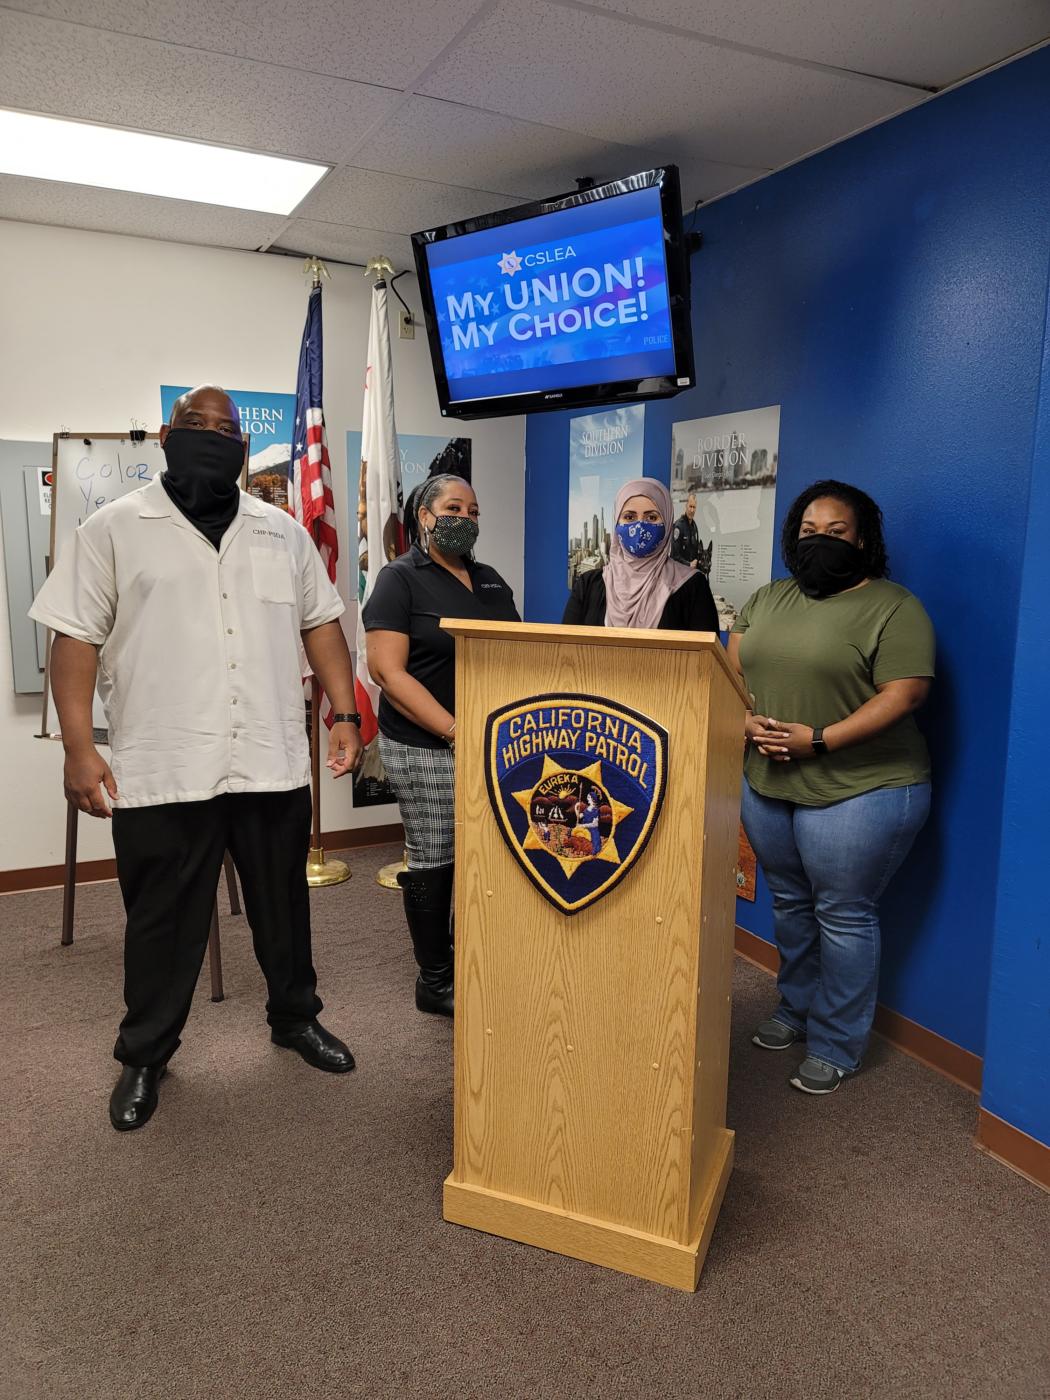 CHP-PSDA Welcomes New Dispatchers to Union Membership